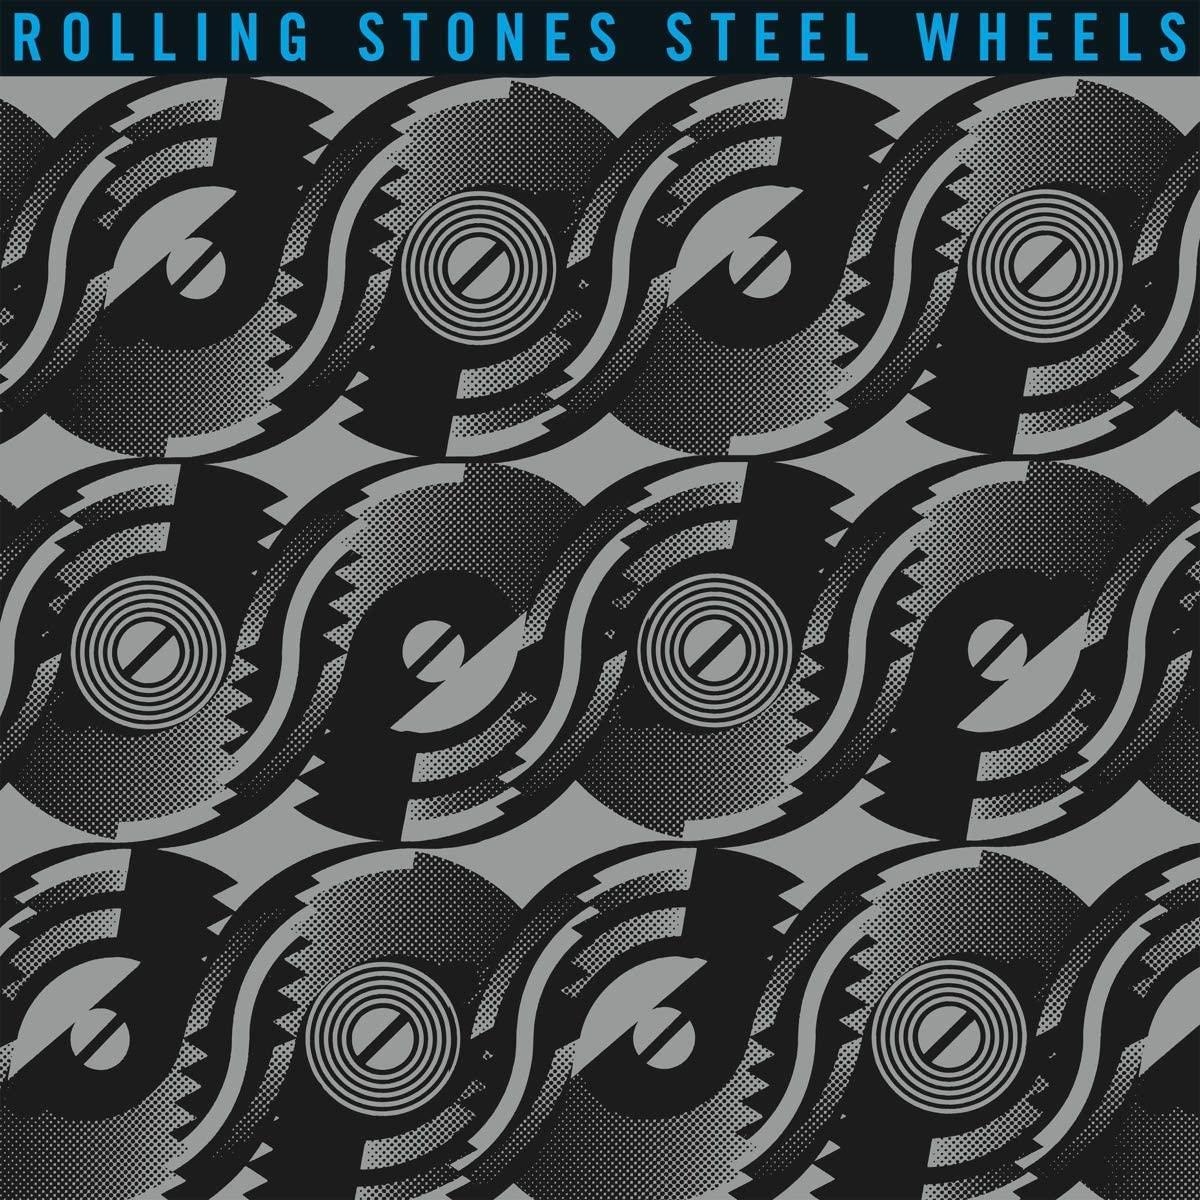 Copertina Vinile 33 giri Steel Wheels di The Rolling Stones